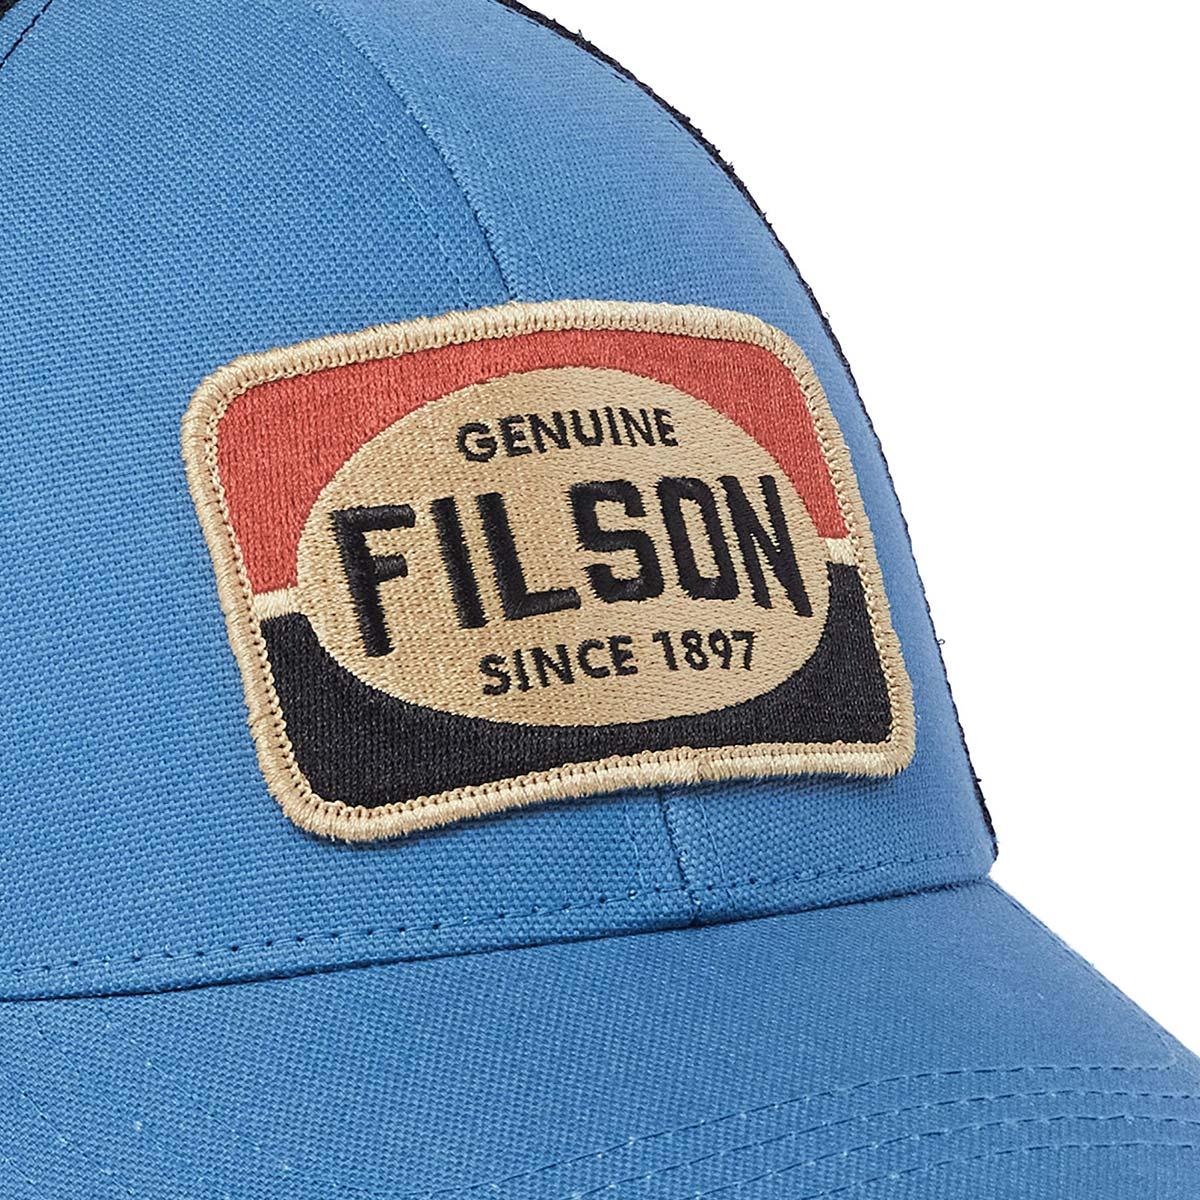 Filson Mesh Snap-Back Logger Cap 20189204-Blue, Robustes 6 Panel Logger Cap mit Mesh Panels für optimale Belüftung